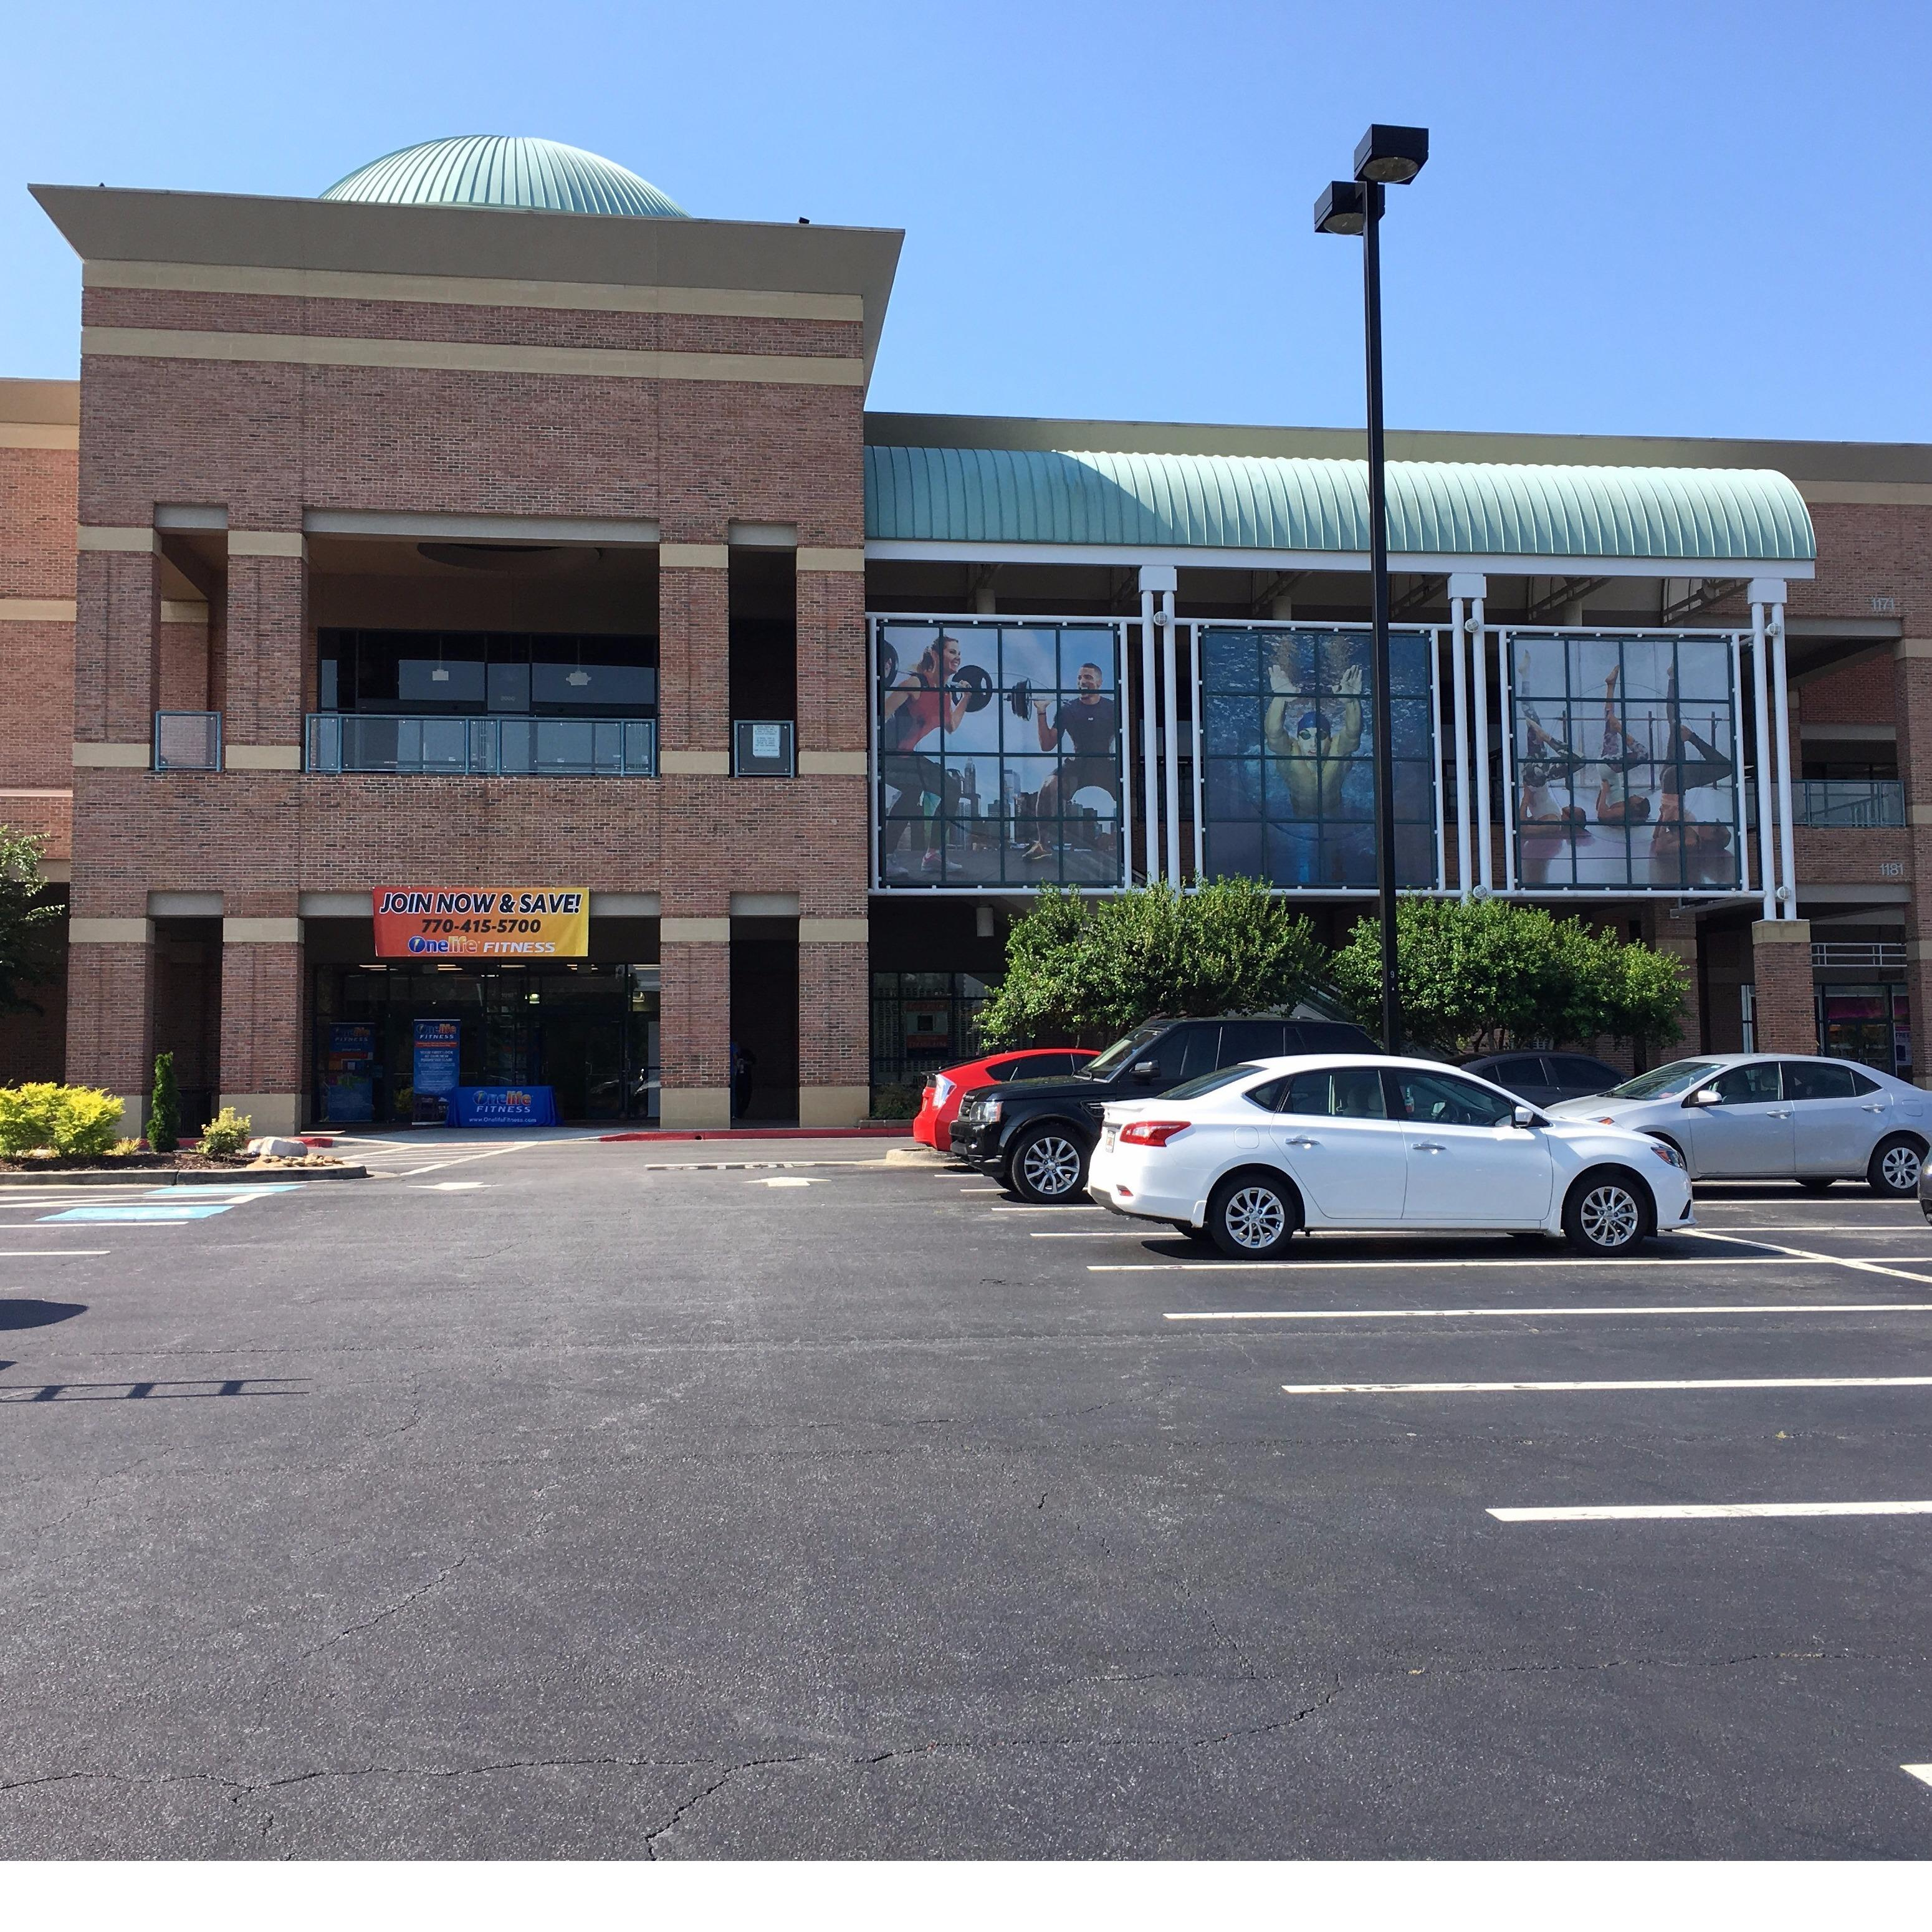 Onelife Fitness - Perimeter - Dunwoody, GA - Health Clubs & Gyms